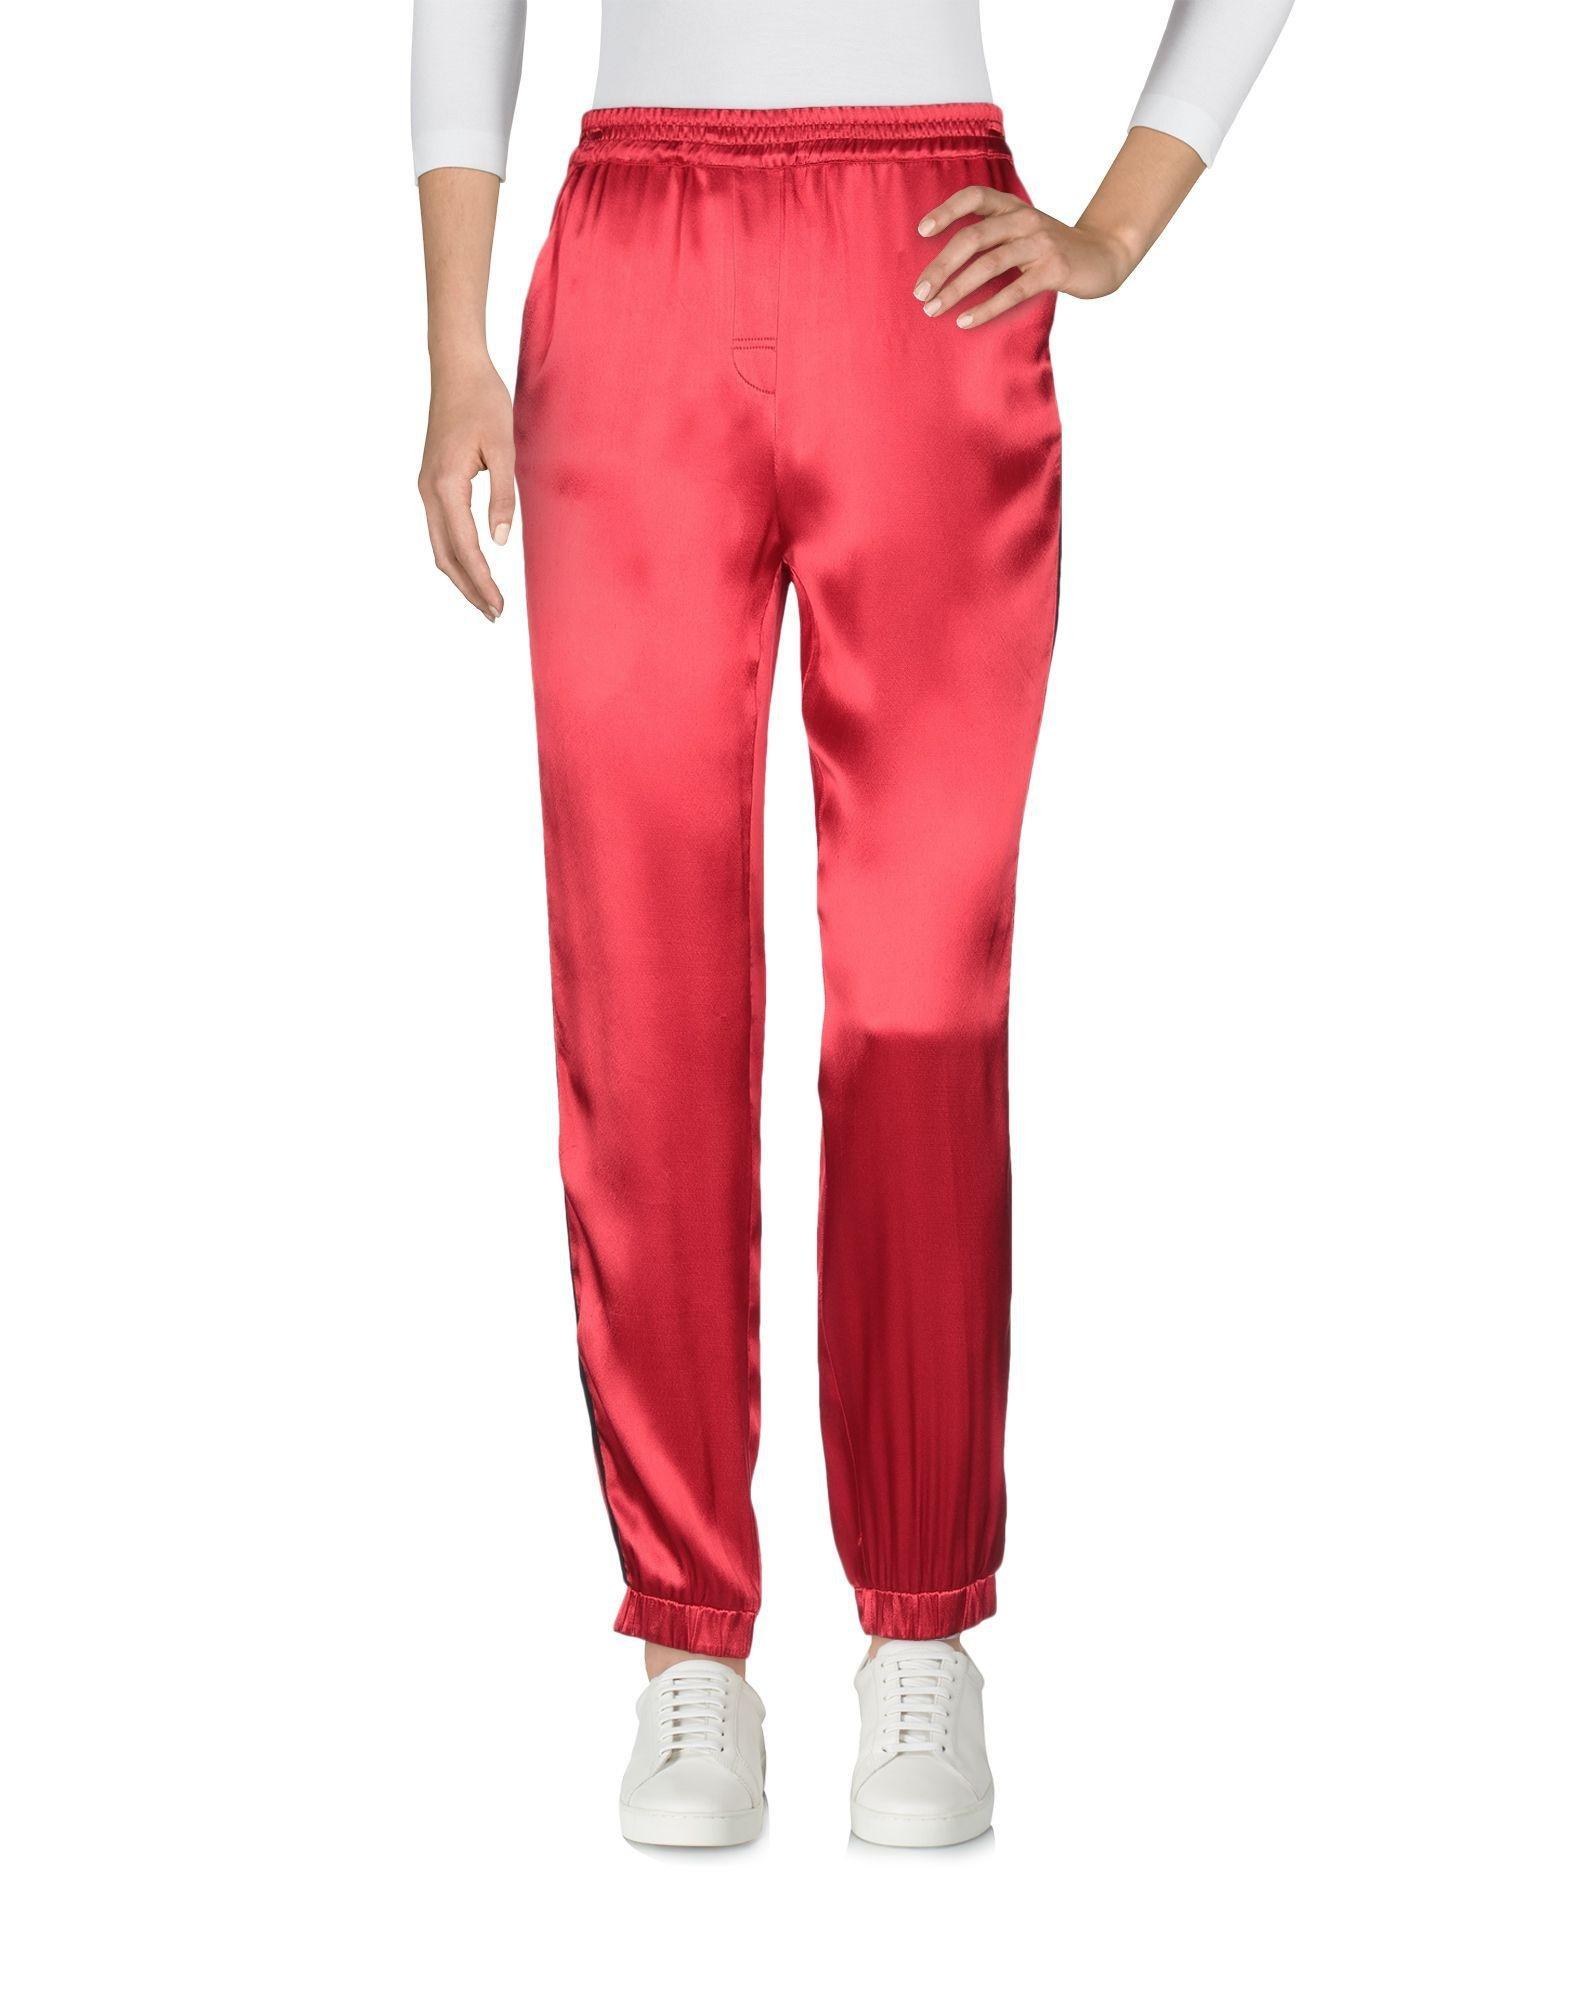 Pantalones Zoe Karssen de Tejido sintético de color Rojo